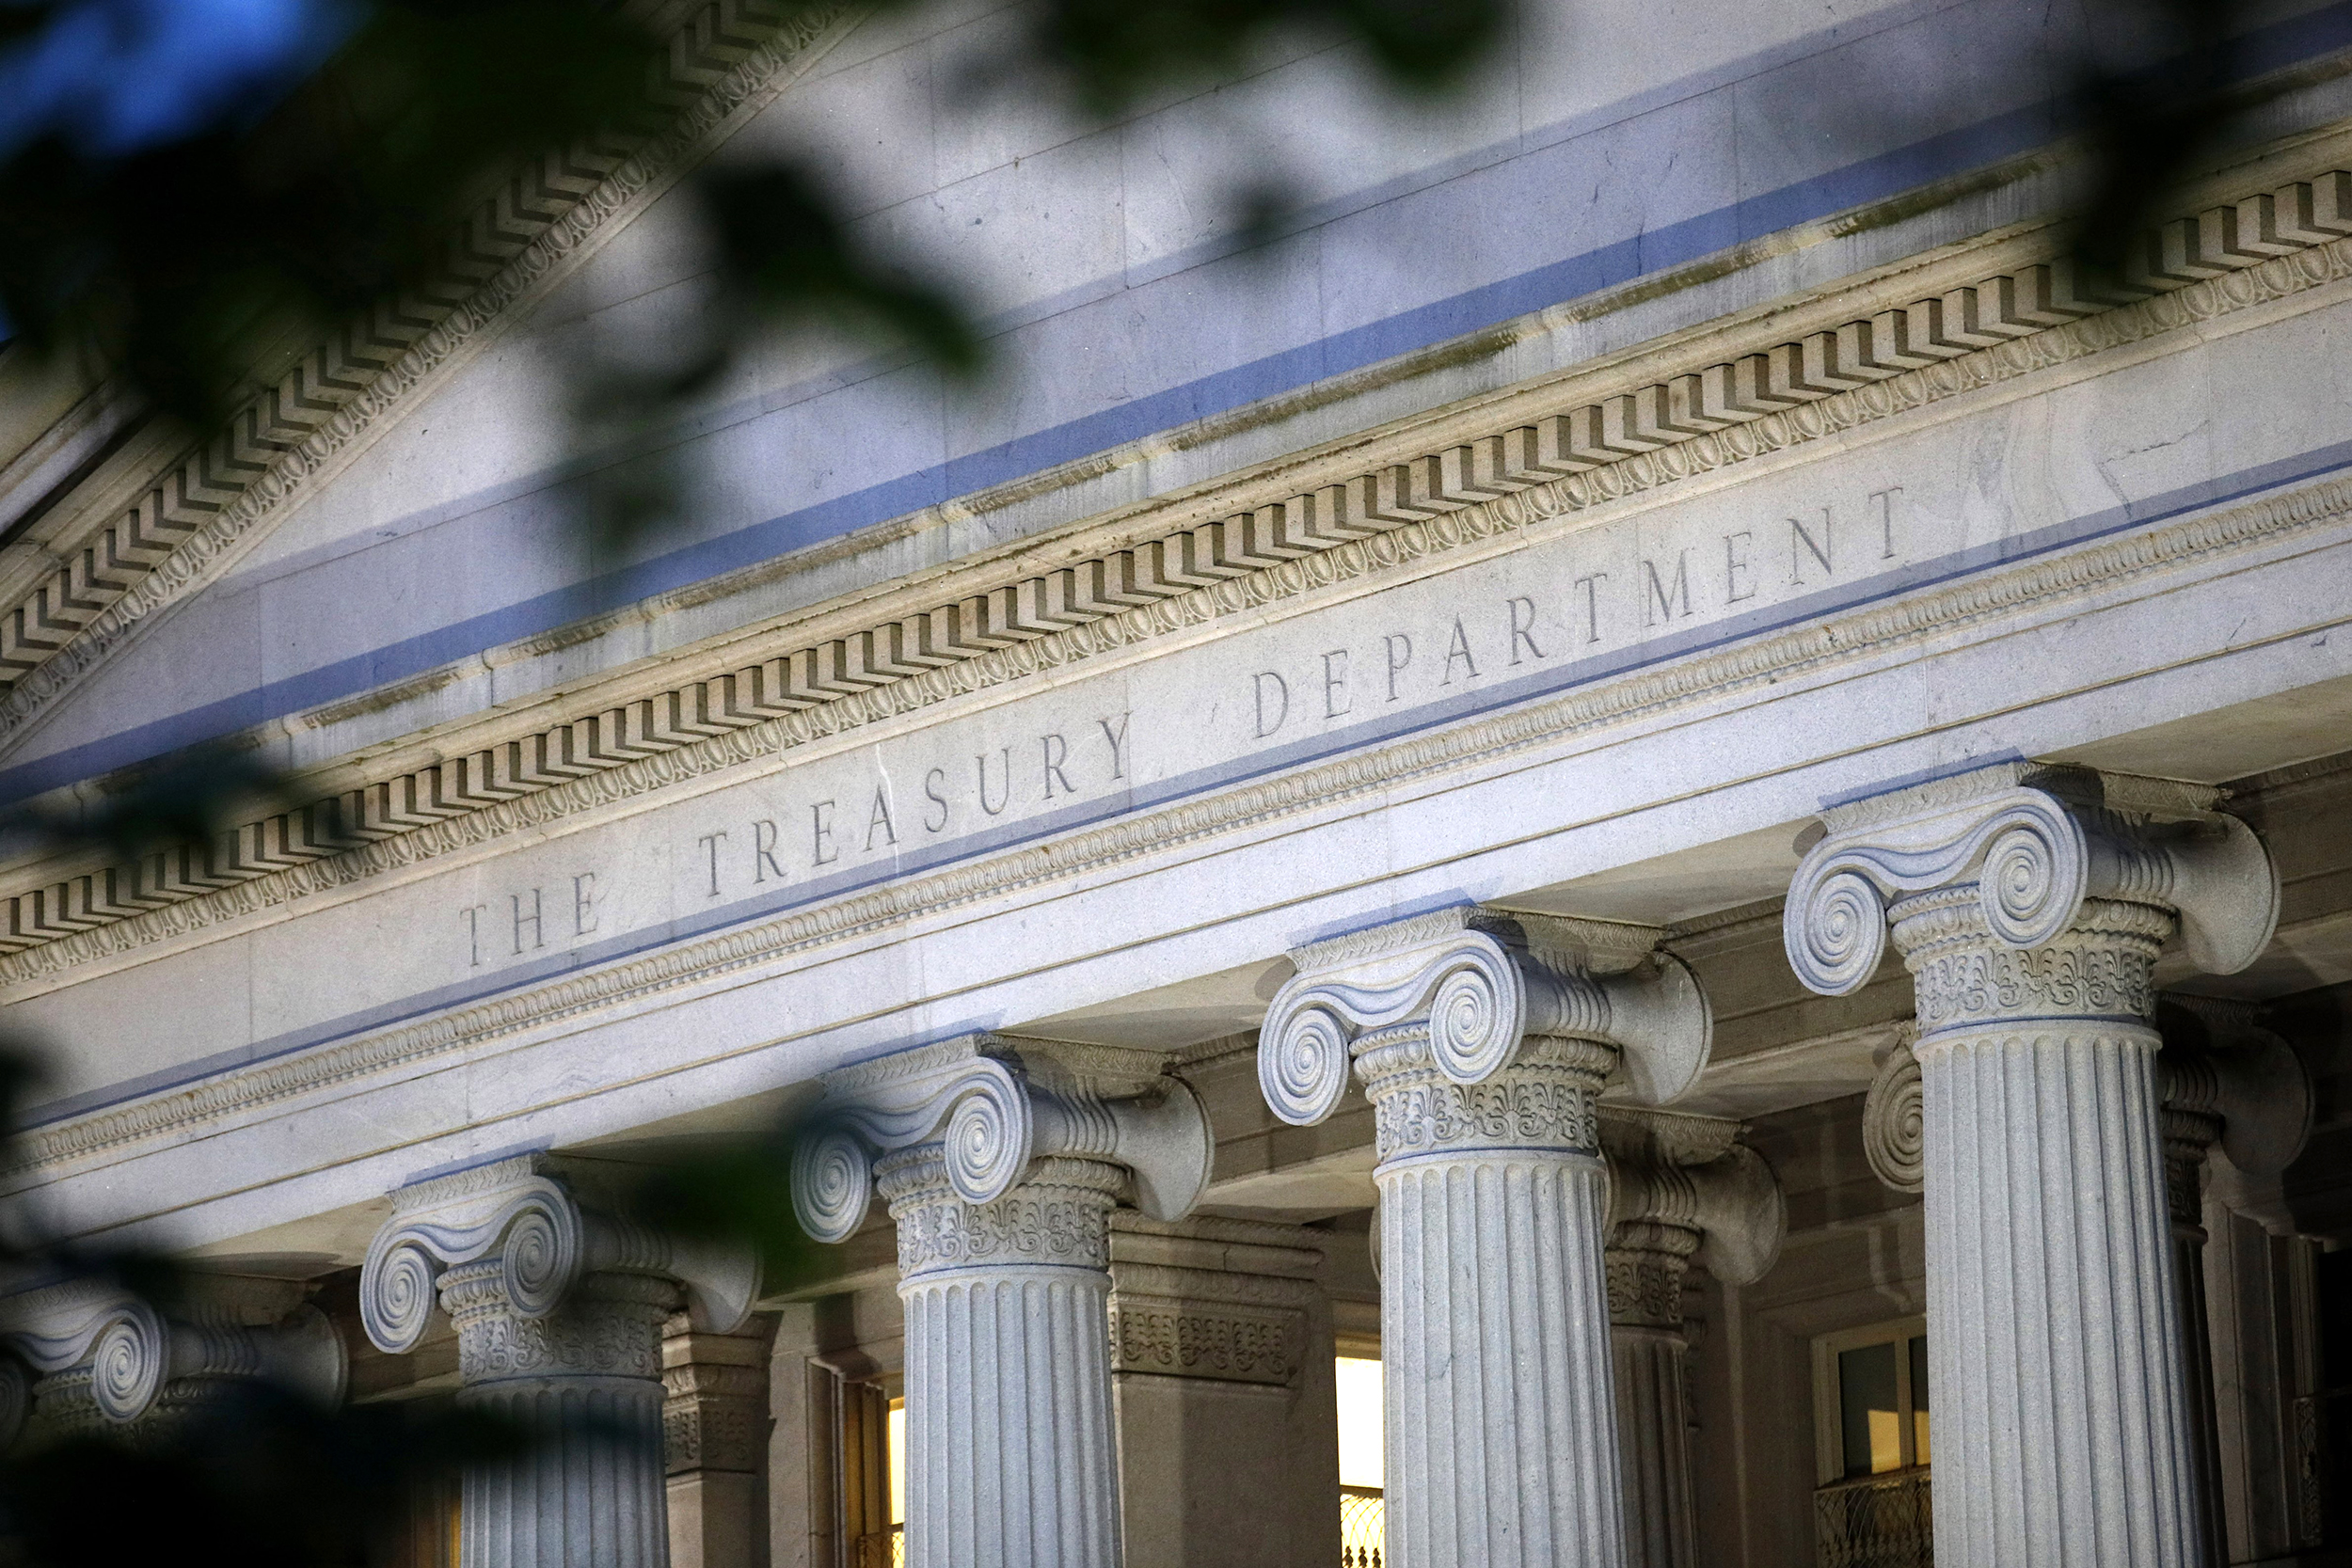 Needing urgent help, Americans await answers on stimulus